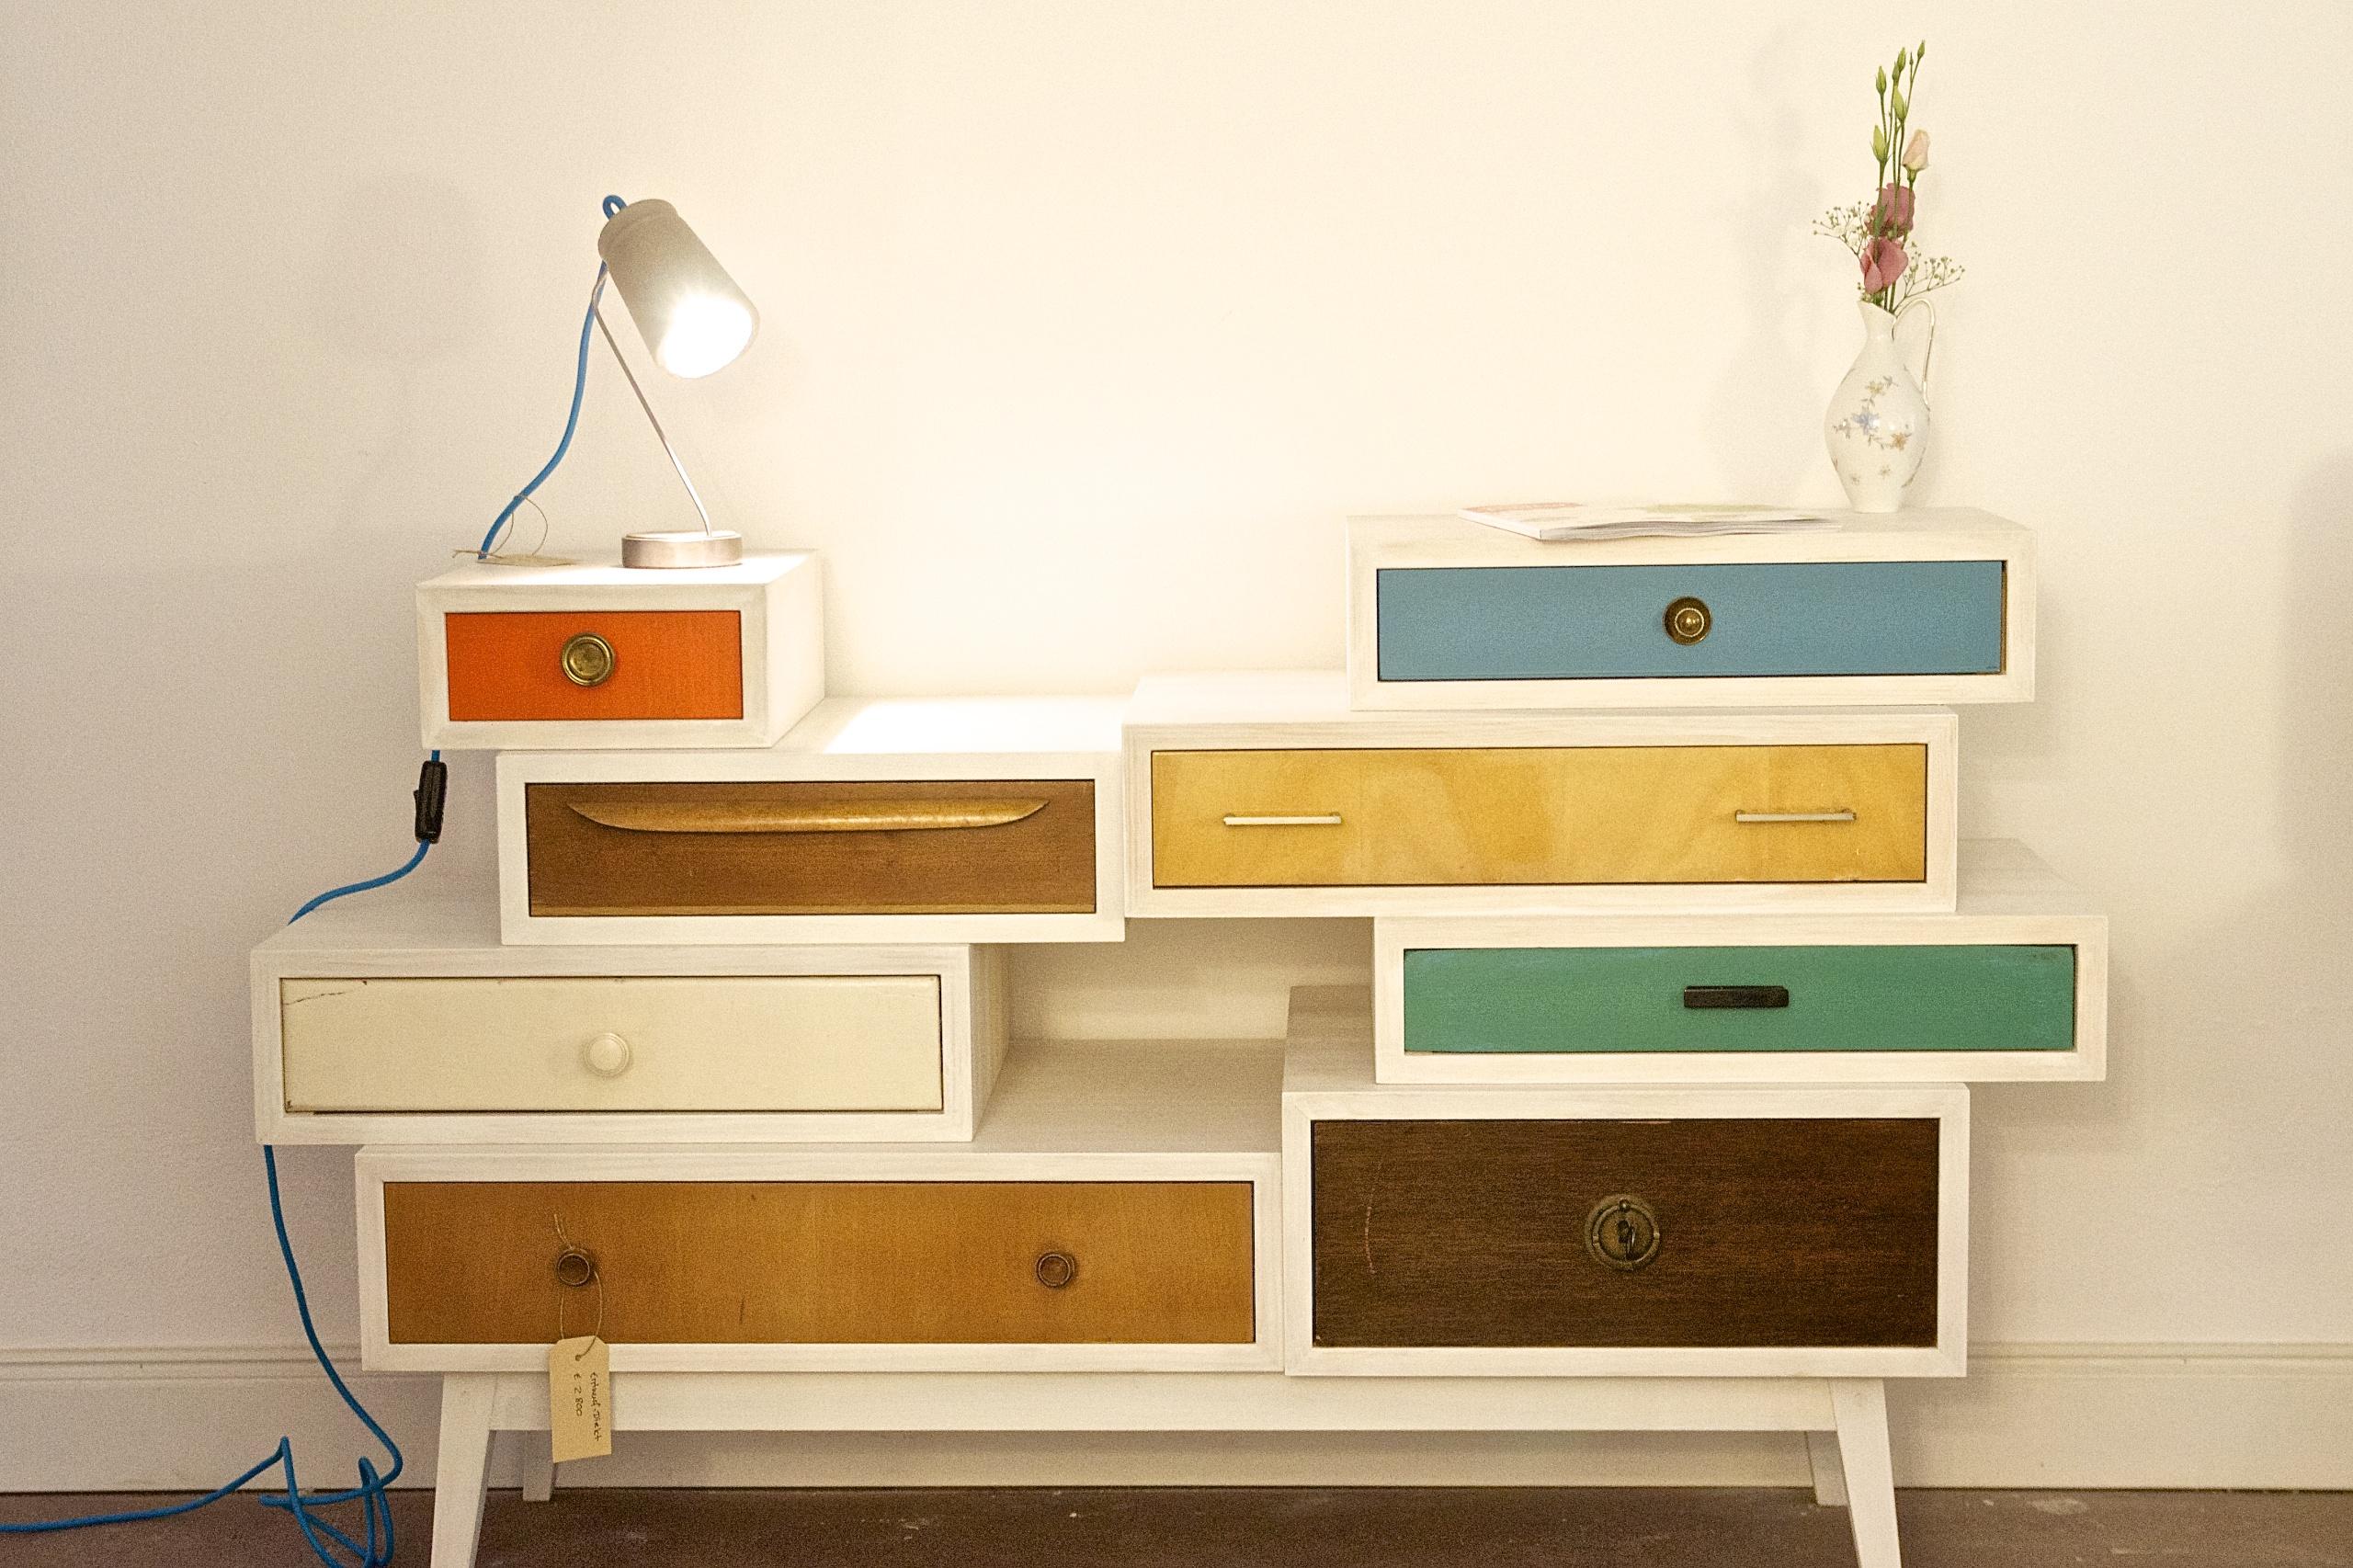 waffeln design und leidenschaft salon wechsel dich pinkepank. Black Bedroom Furniture Sets. Home Design Ideas